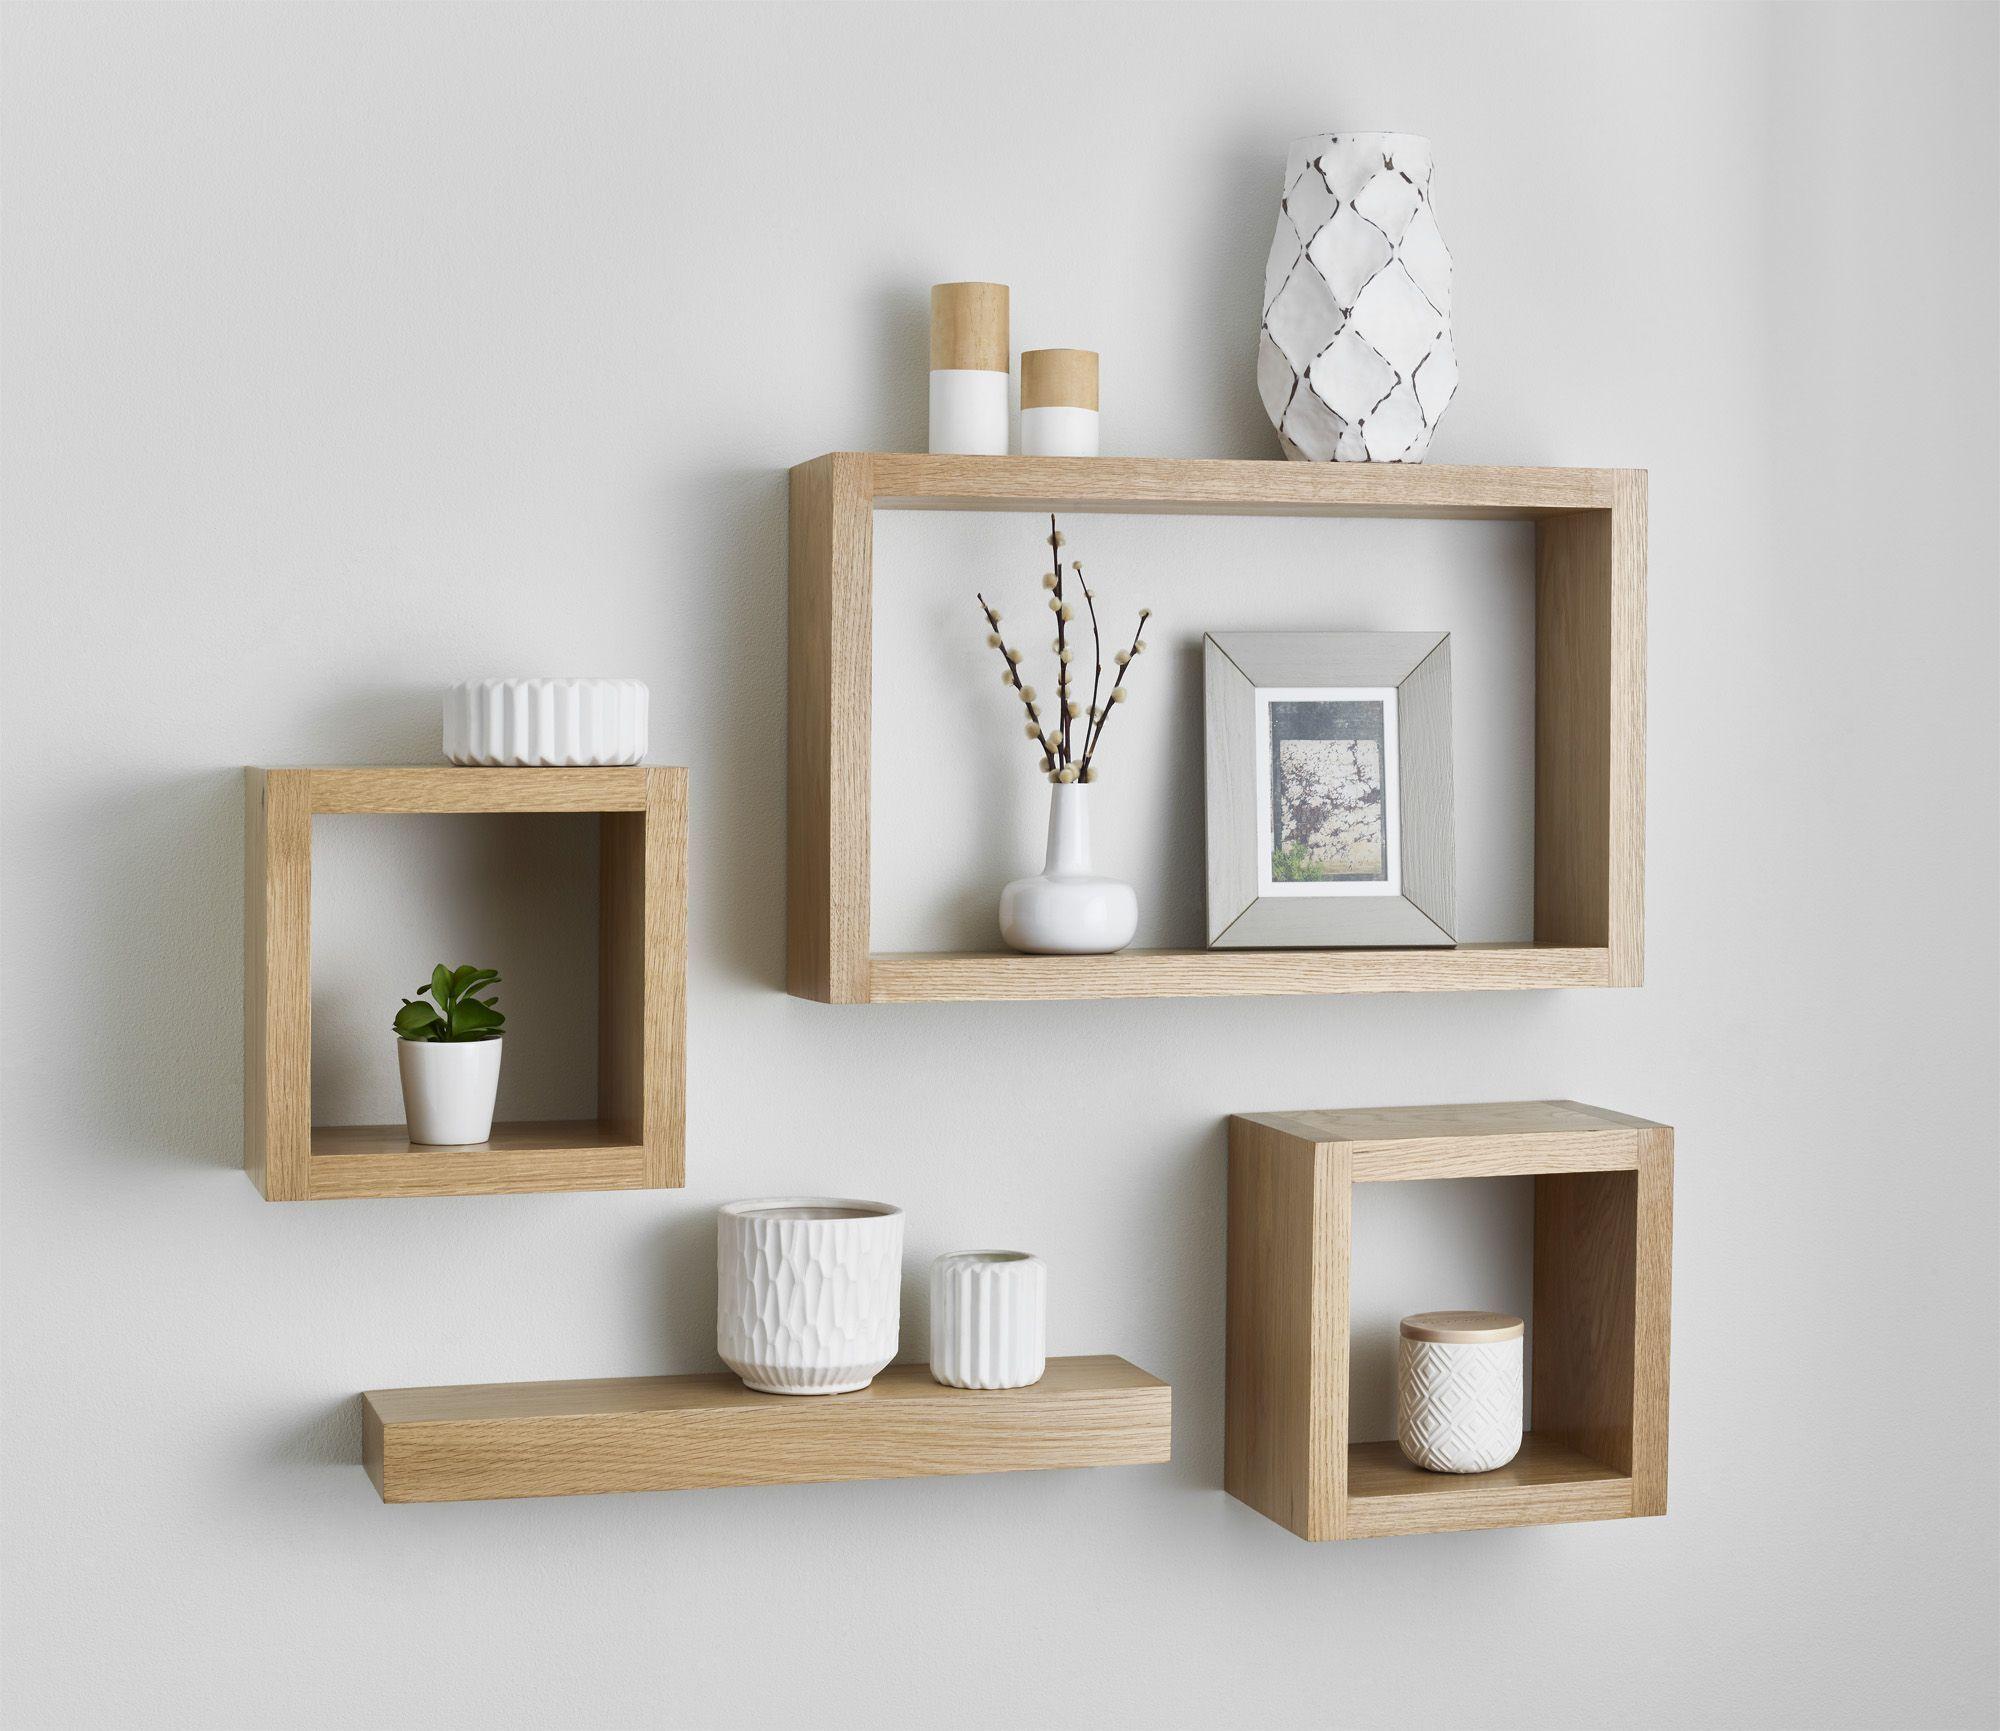 14 Outstanding Hanging Shelves Range Hoods Ideas Floating Cube